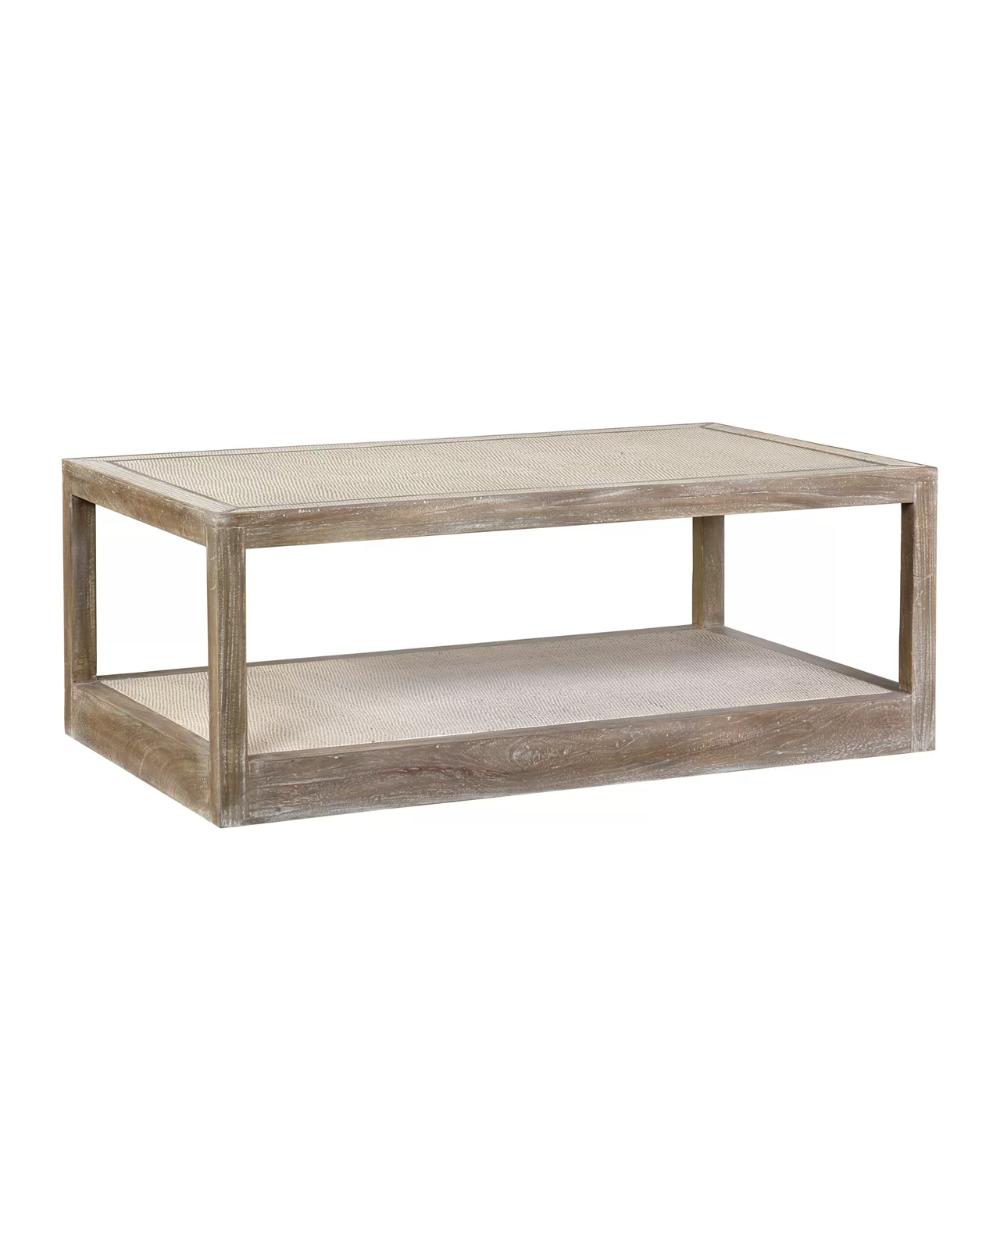 Anatolie Floor Shelf Coffee Table Joss Main Coffee Table Floor Shelf Coffee Table Joss And Main [ 1250 x 1000 Pixel ]